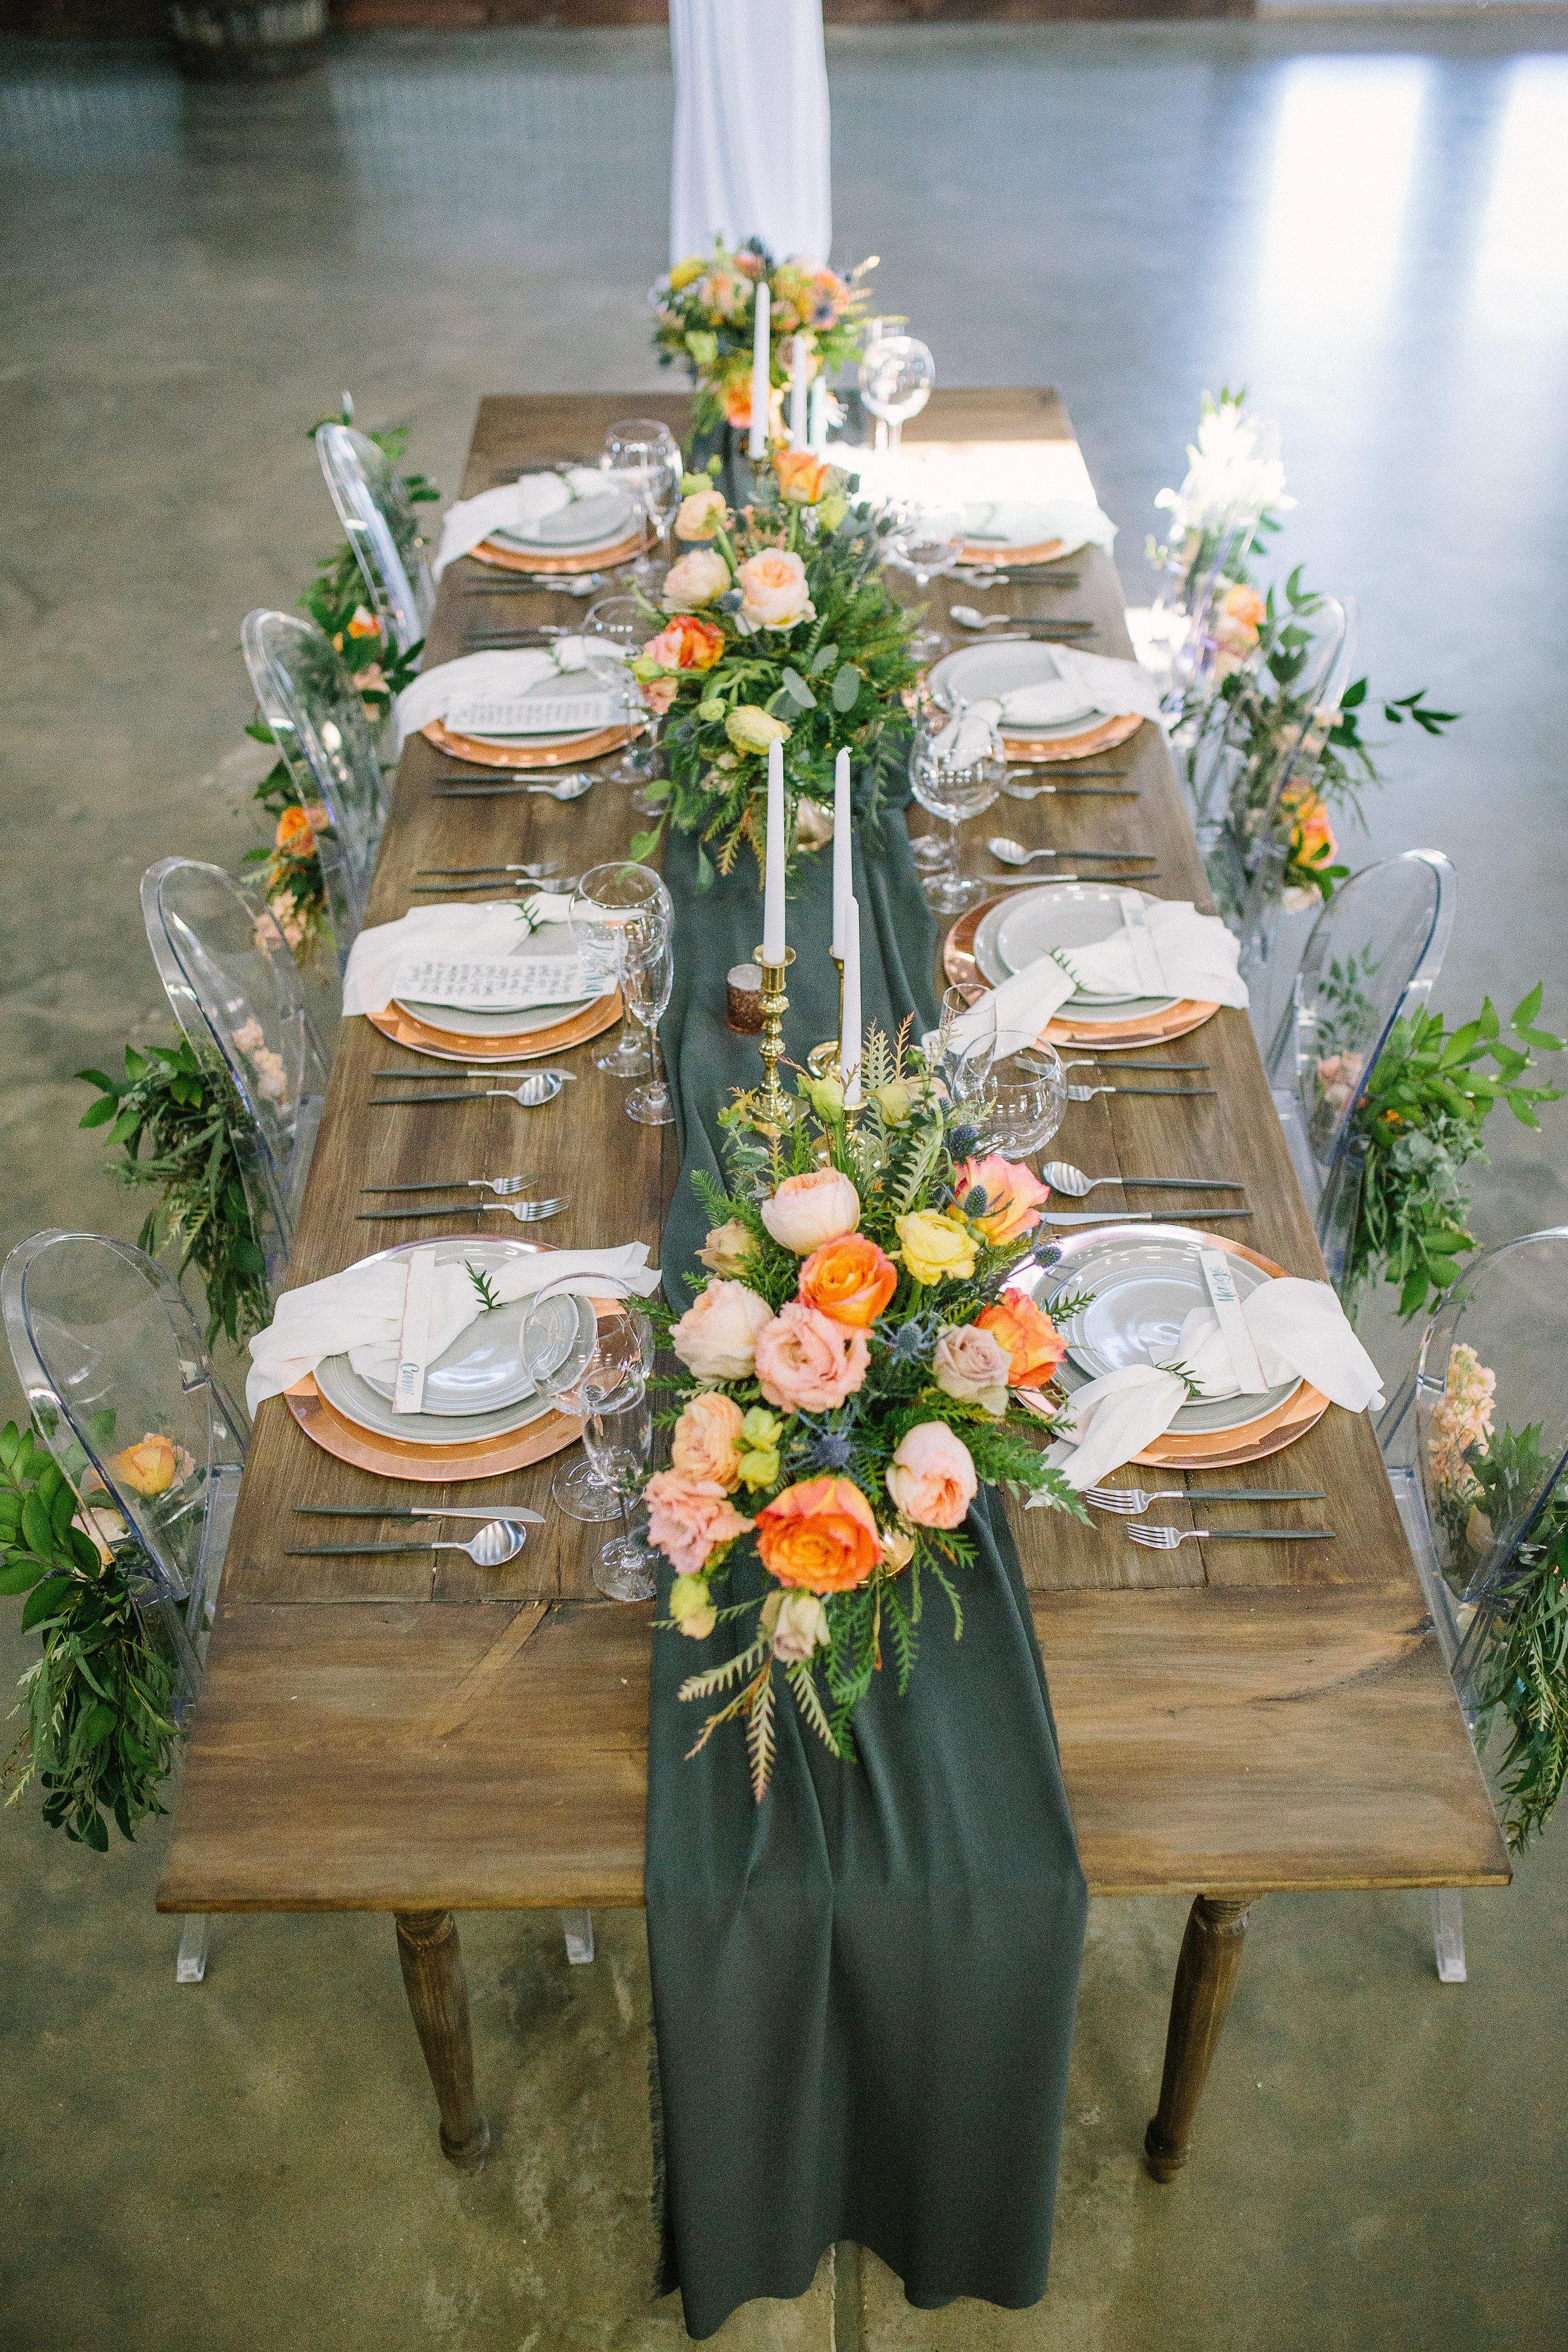 Ellen-Ashton-Photography-Peach-Creek-Ranch-Weddings-Wed-and-Prosper129